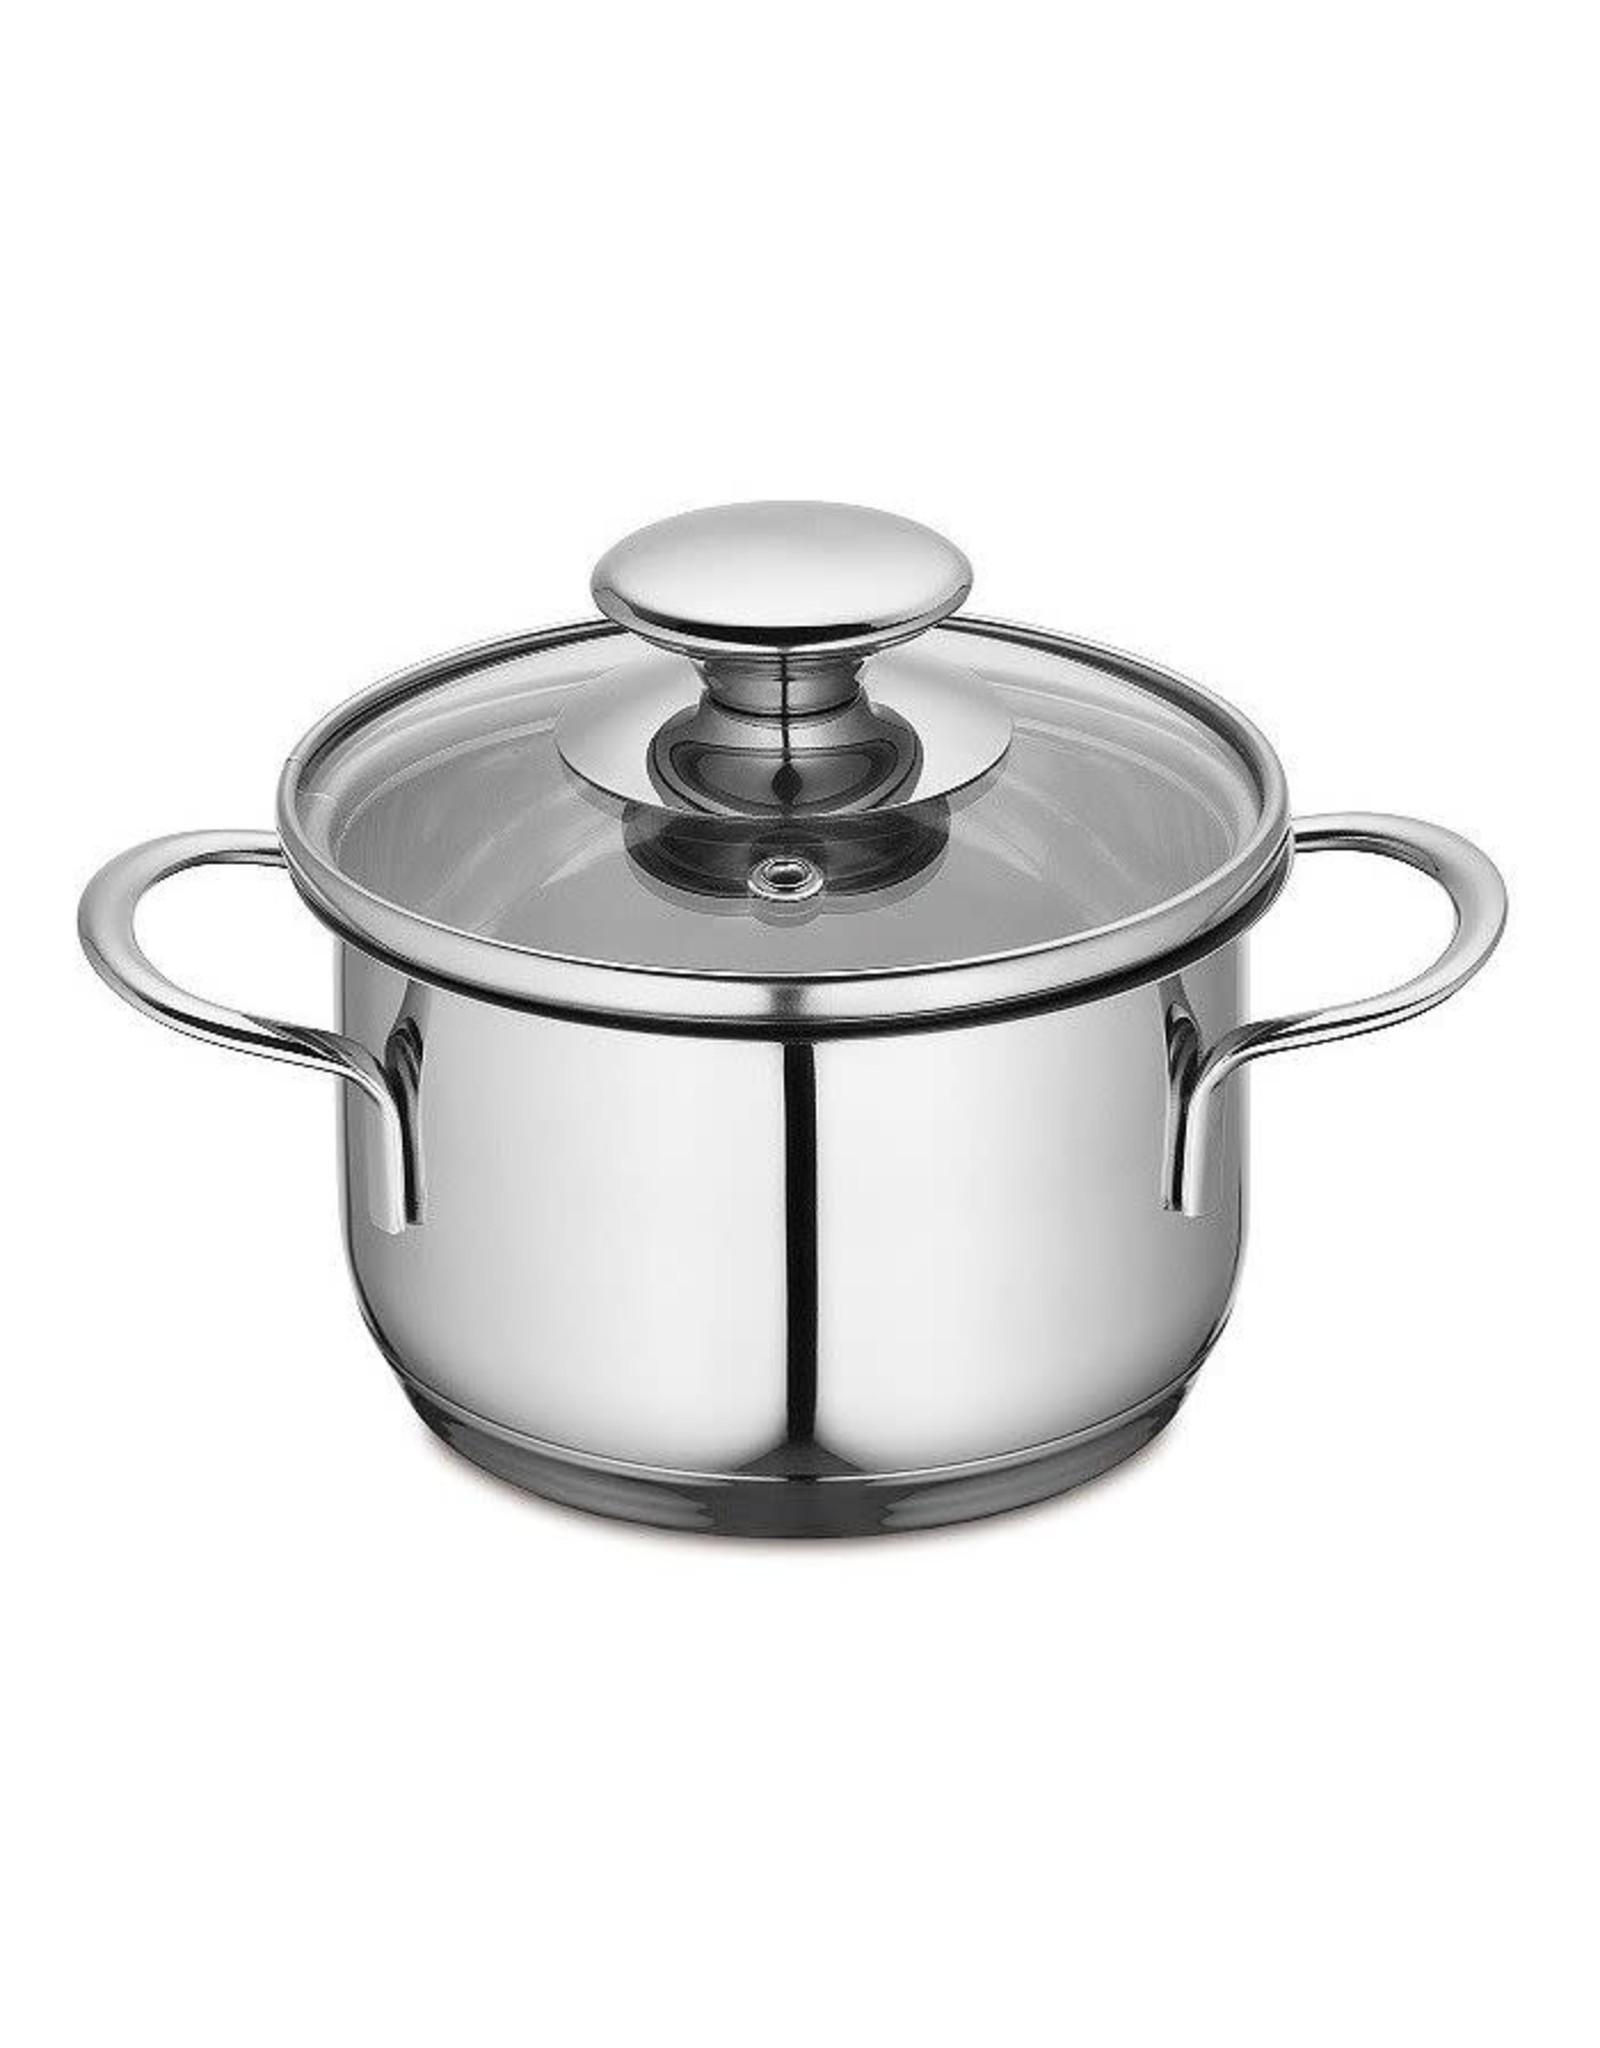 Küchenprofi Mini-kookpannetje 12cm